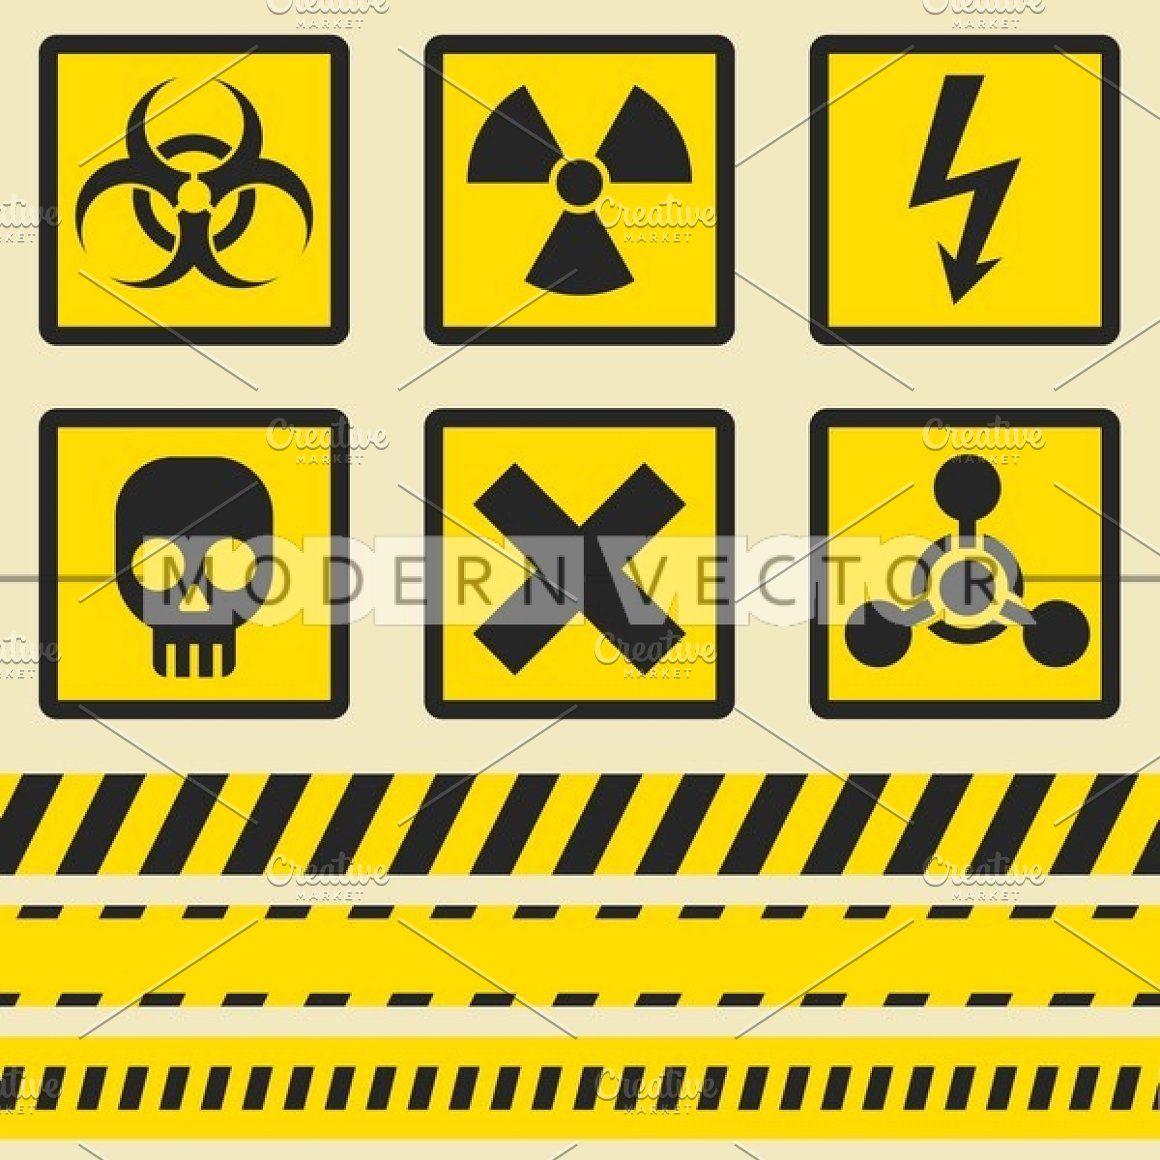 Warning signs symbols icon set background vector design